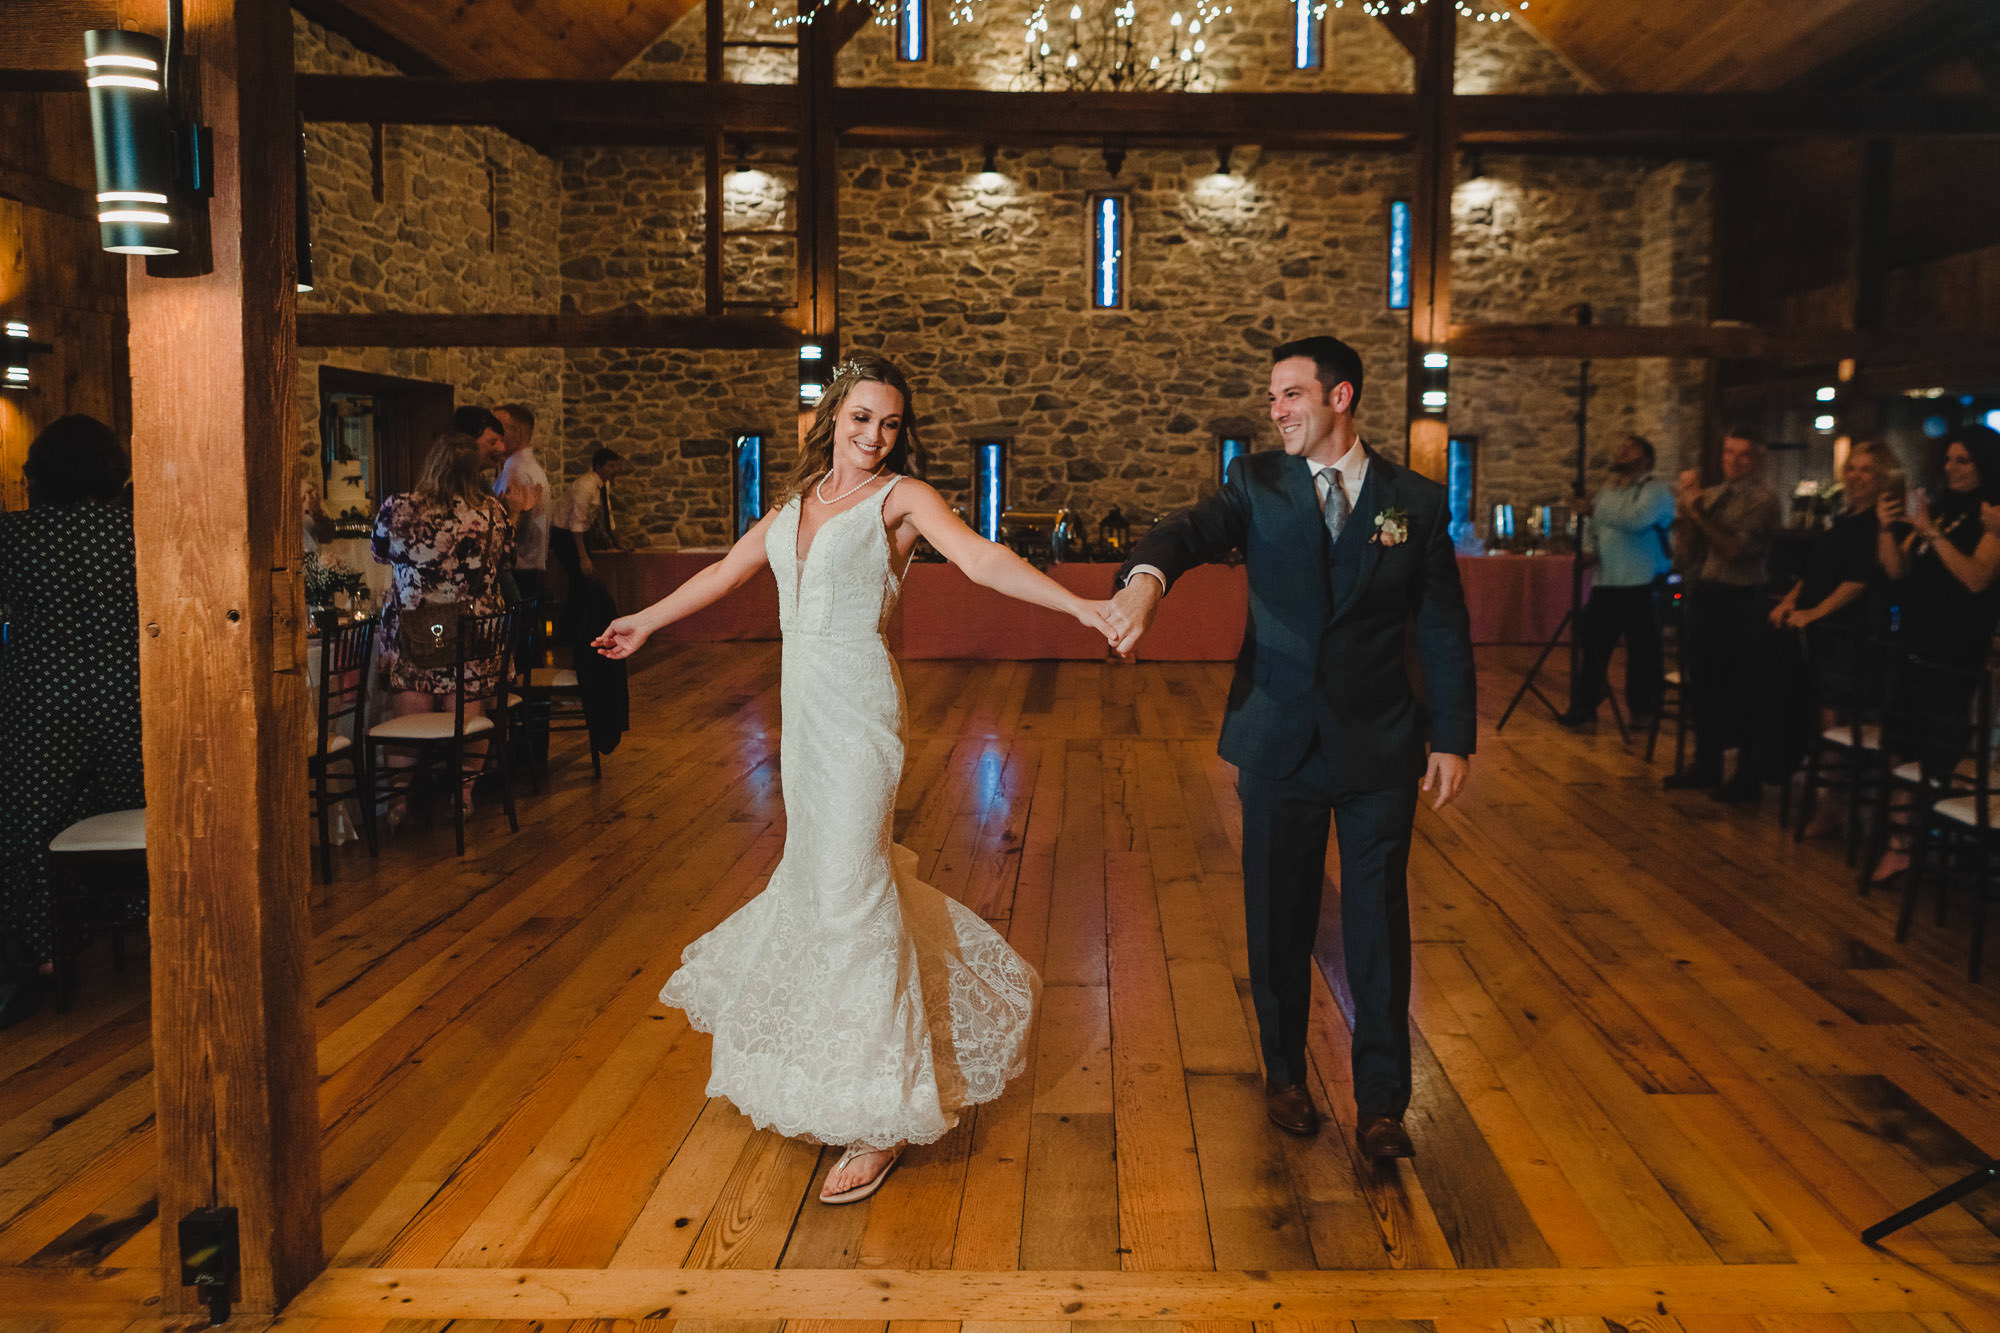 The Barn at Silverstone Wedding - Aubrey & Charlie35.JPG